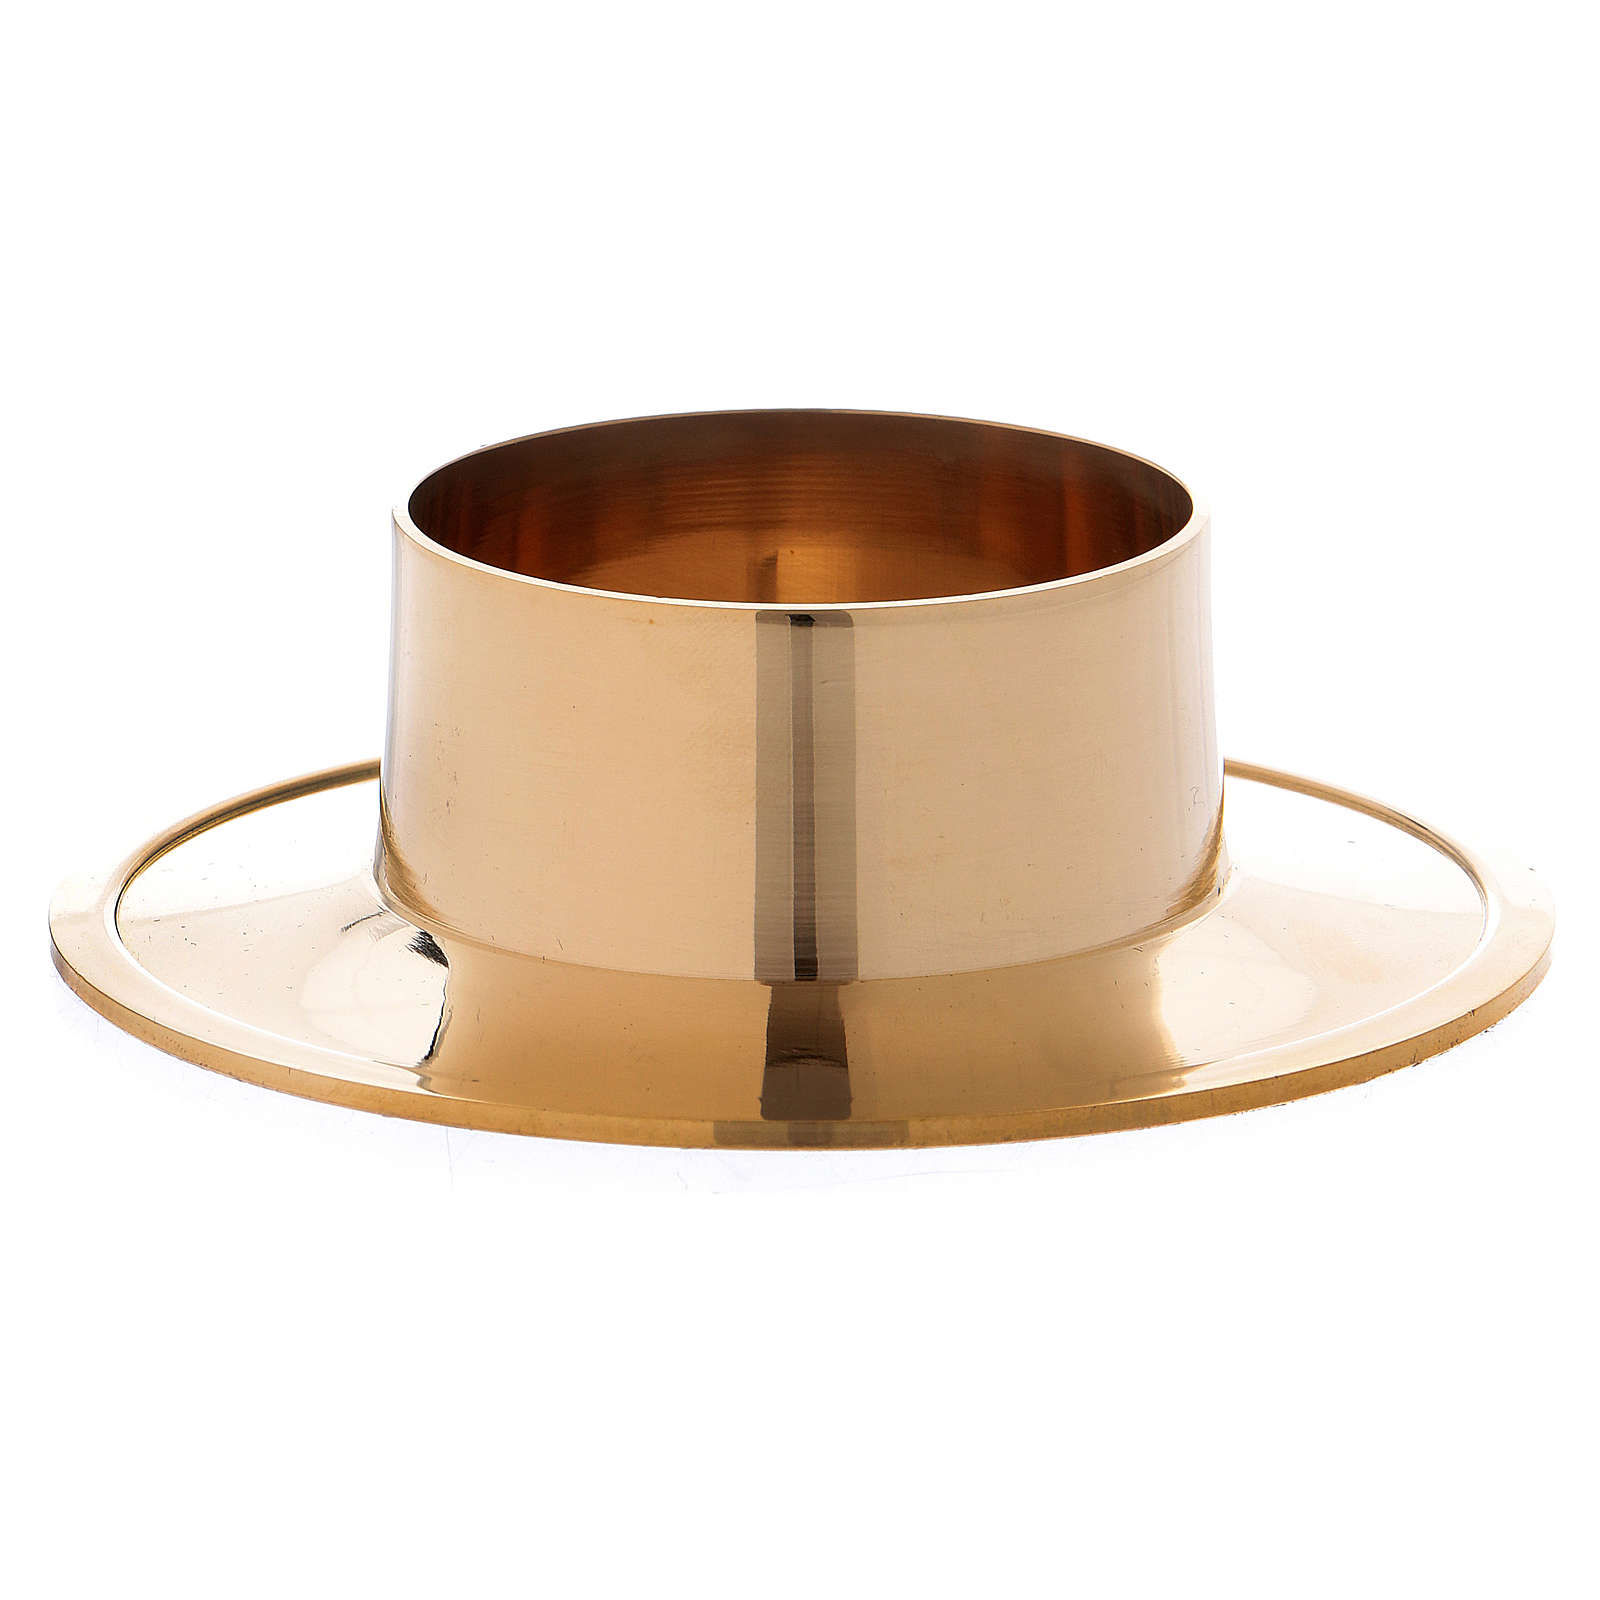 Portacandela semplice ottone dorato lucido 5 cm 4